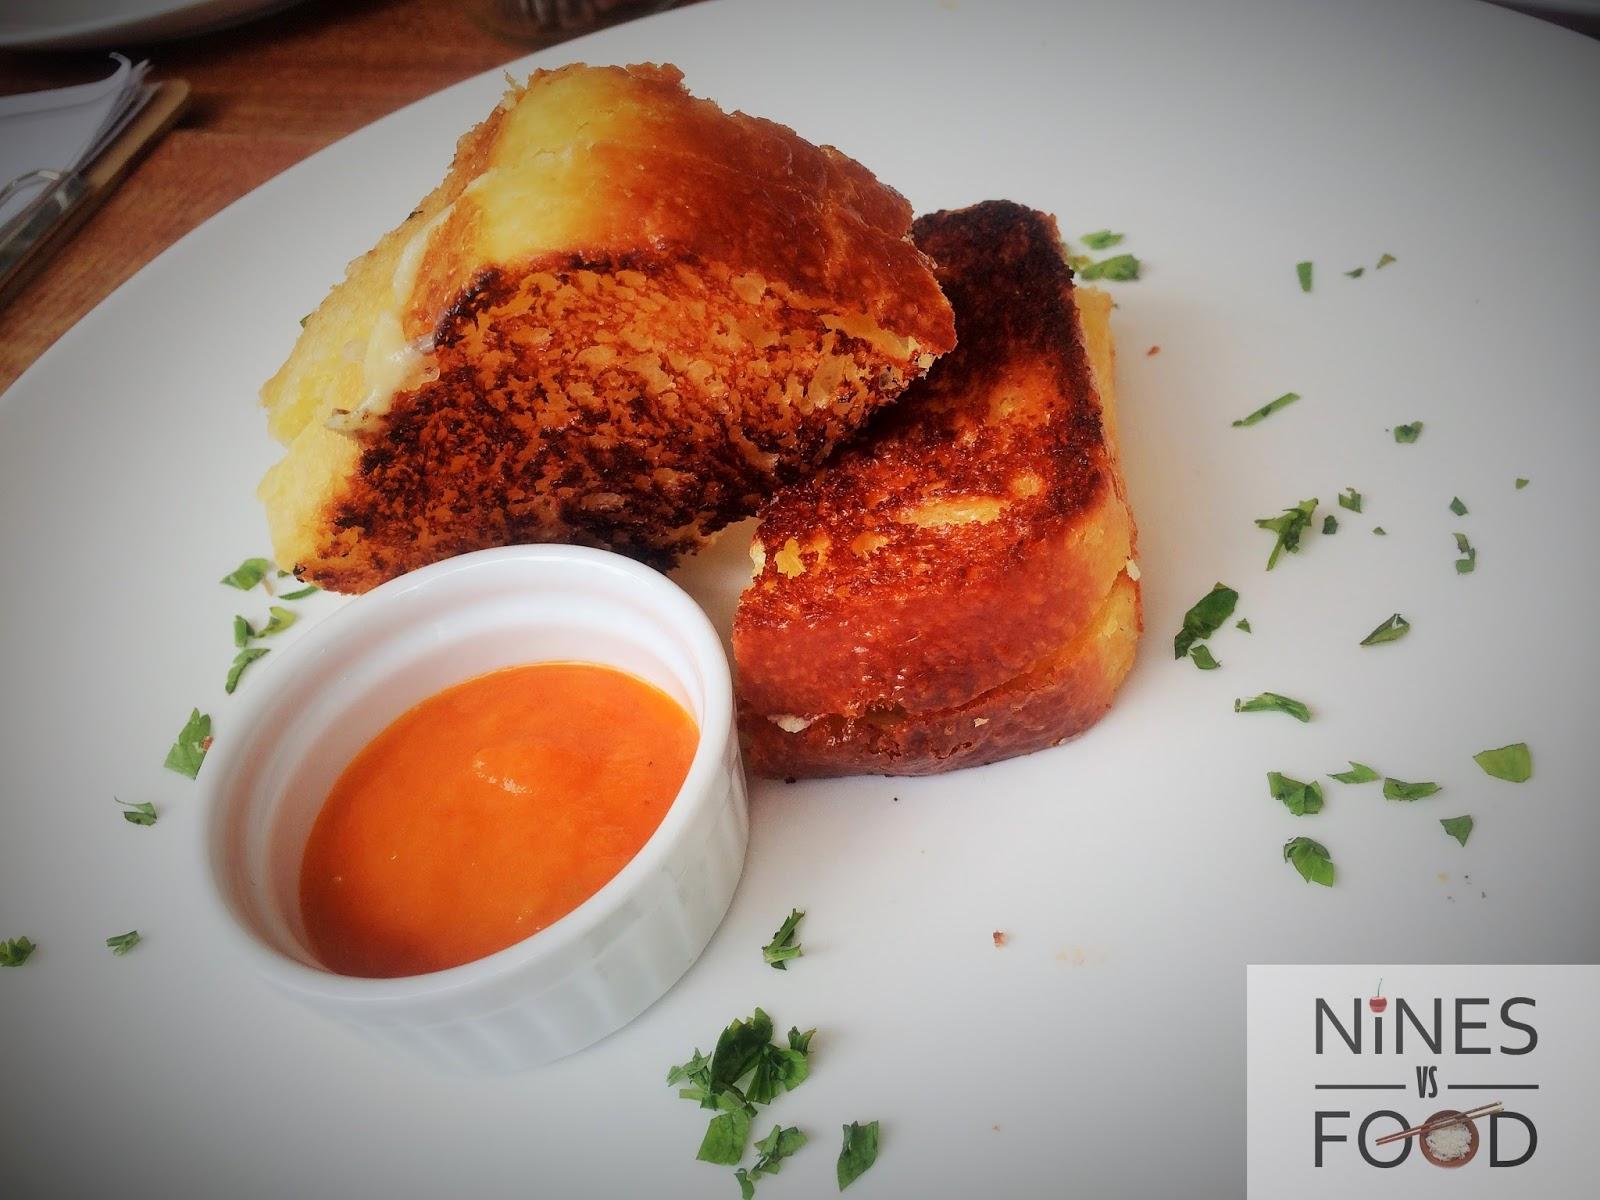 Nines vs. Food - Potts Point Cafe-10.jpg